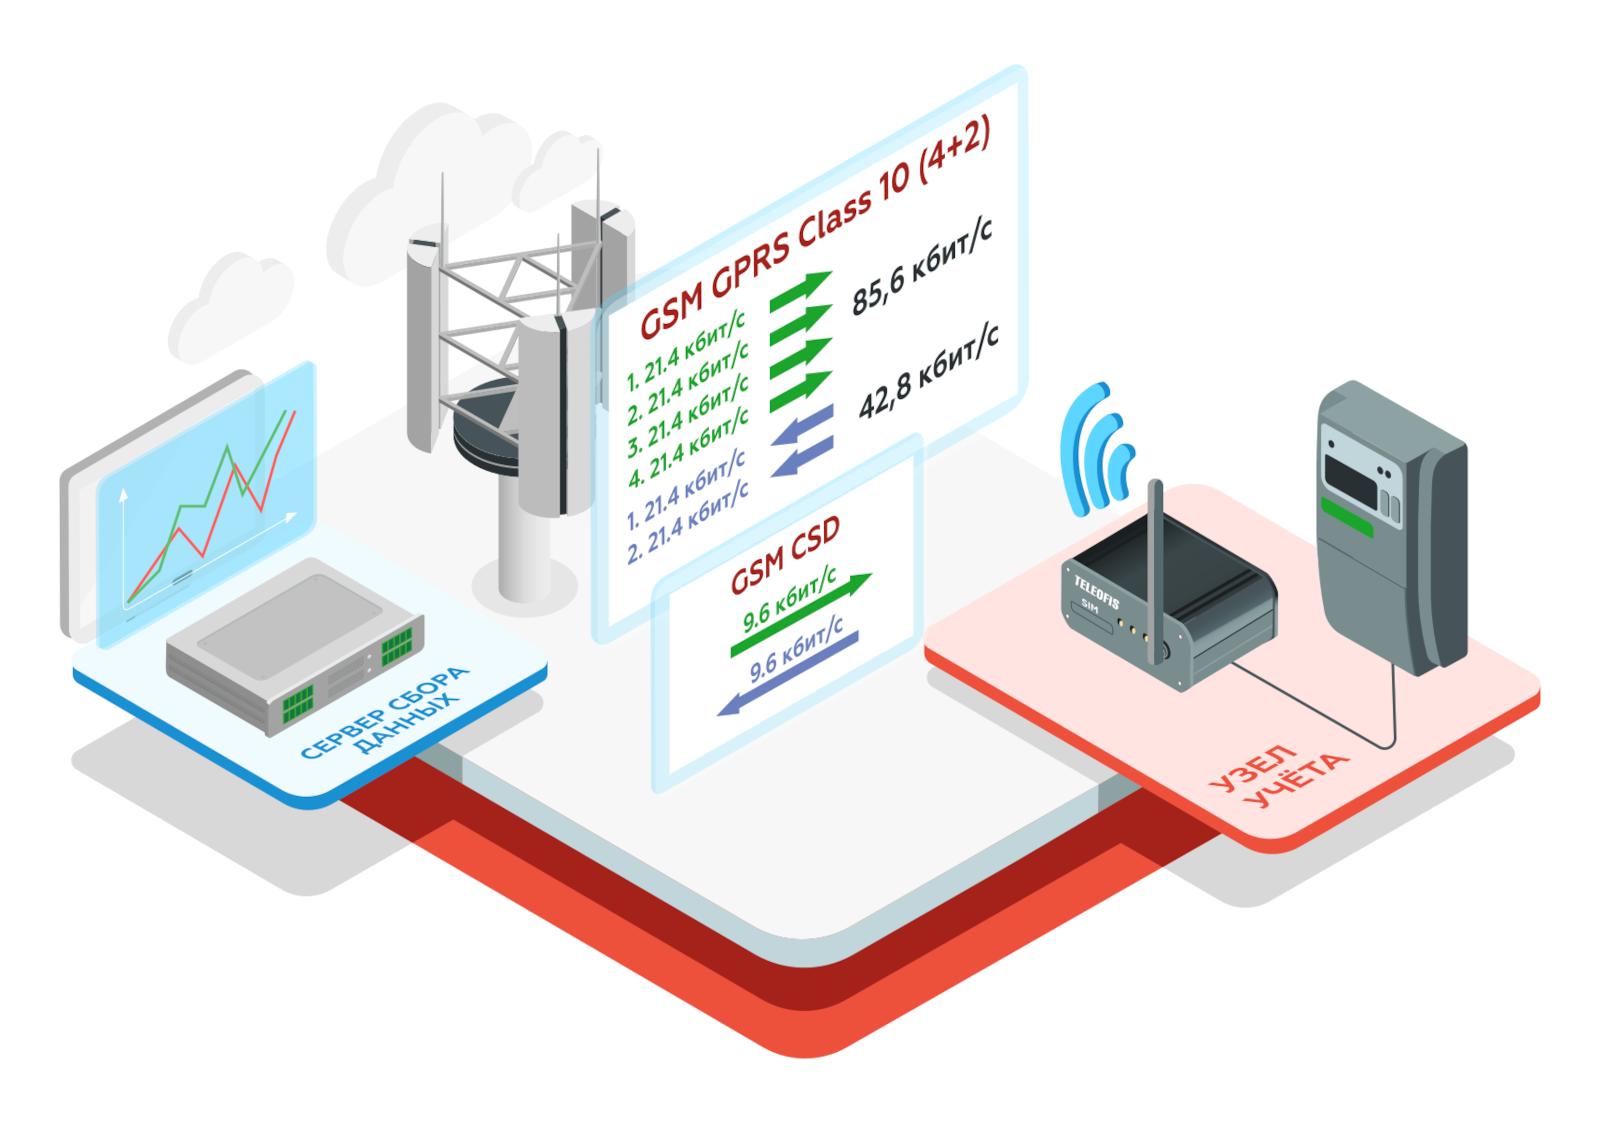 Преимущества технологии GPRS в системах учёта ресурсов — Teleofis.ru